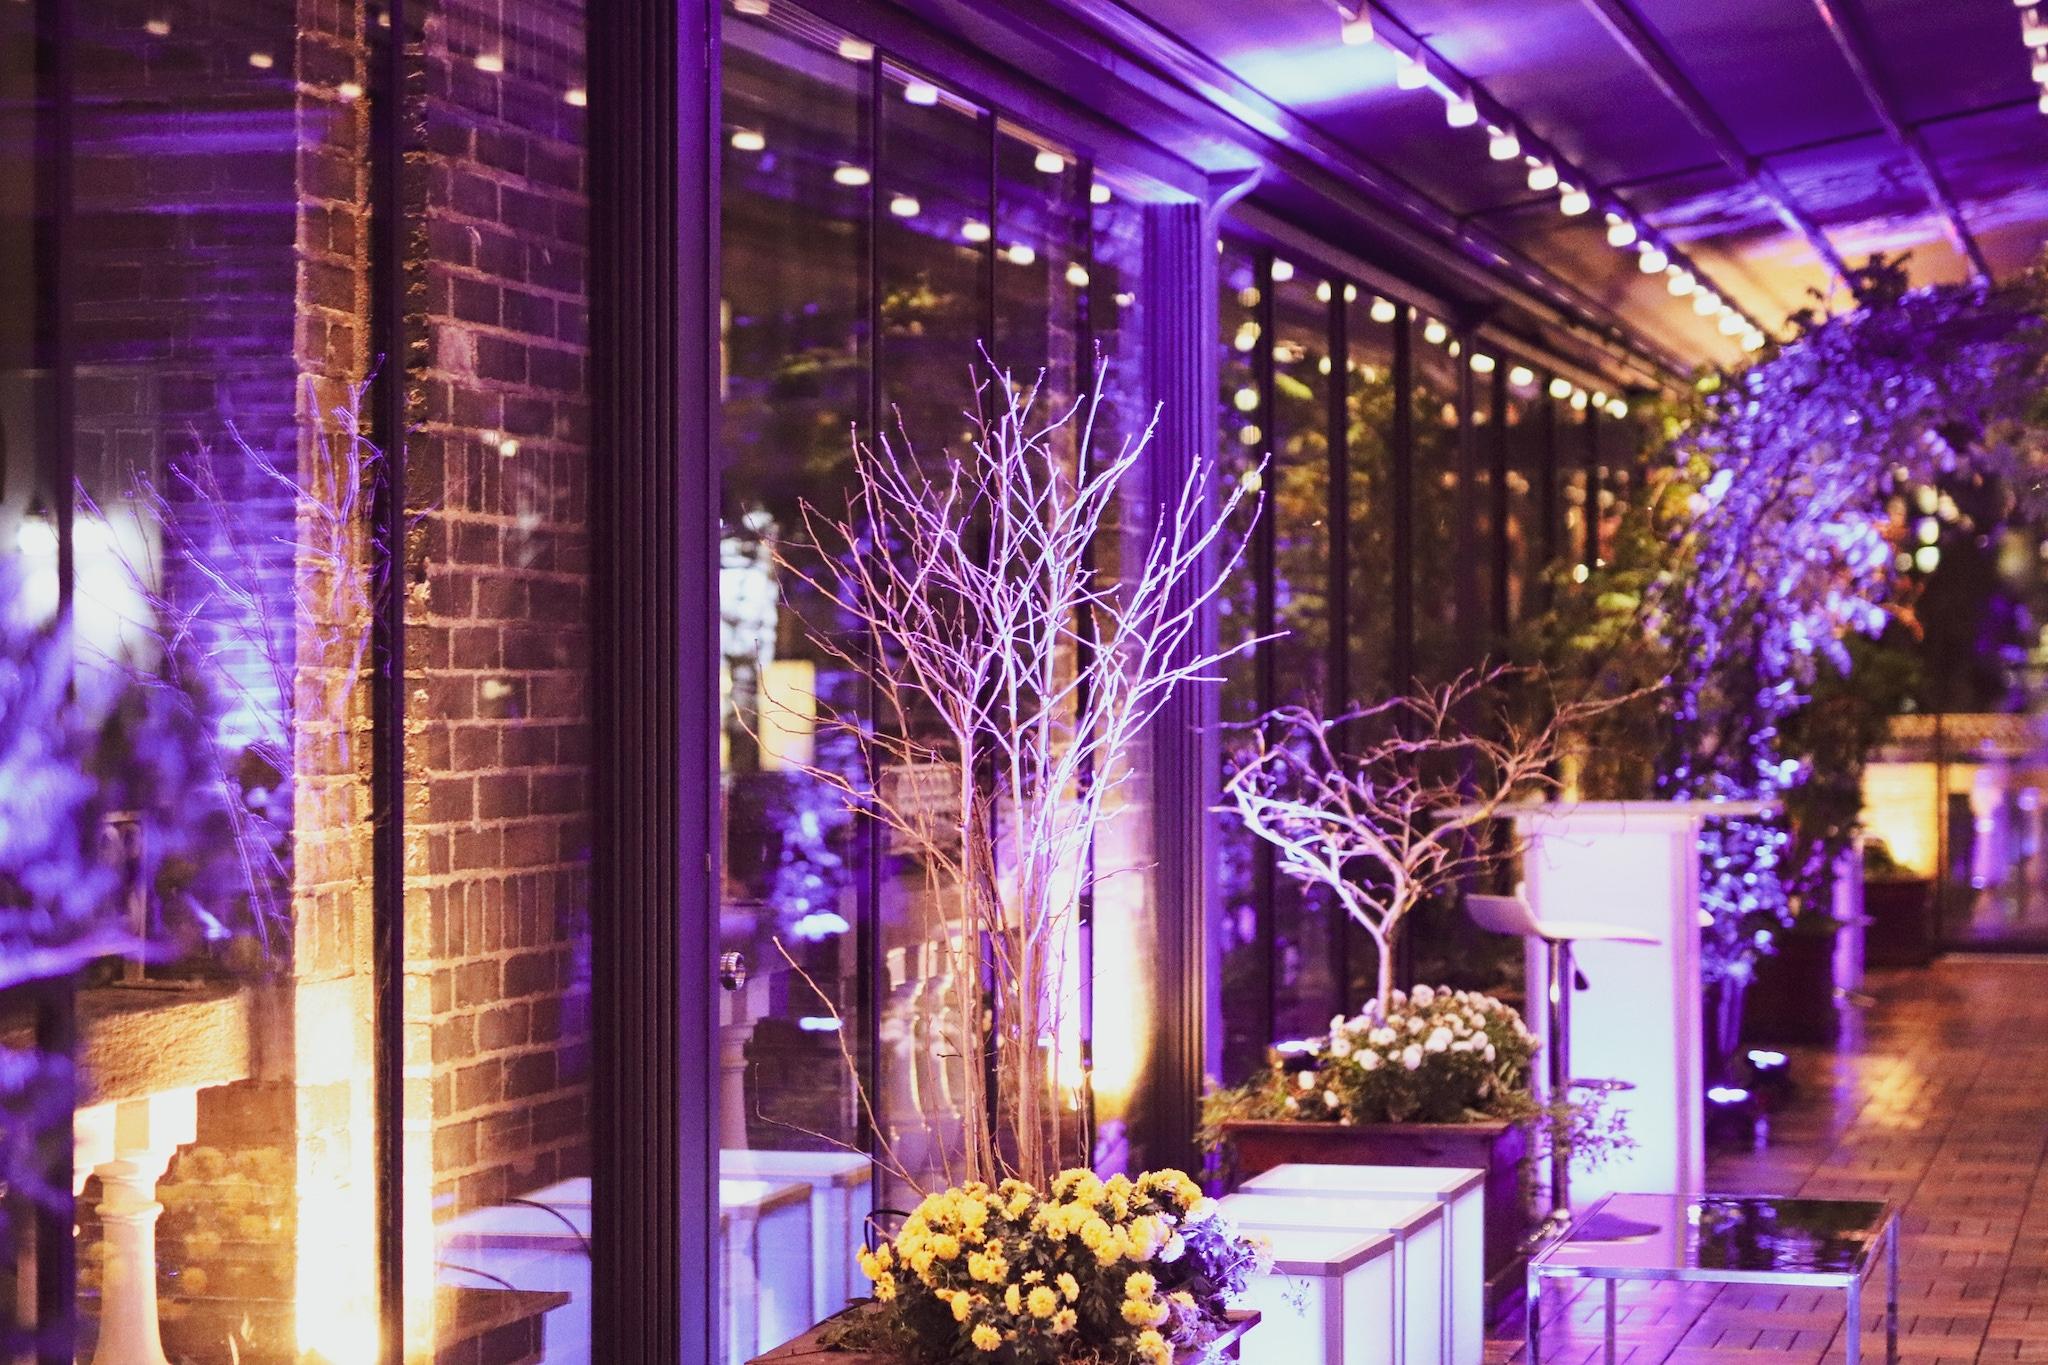 Midtown Loft & Terrace NYC events